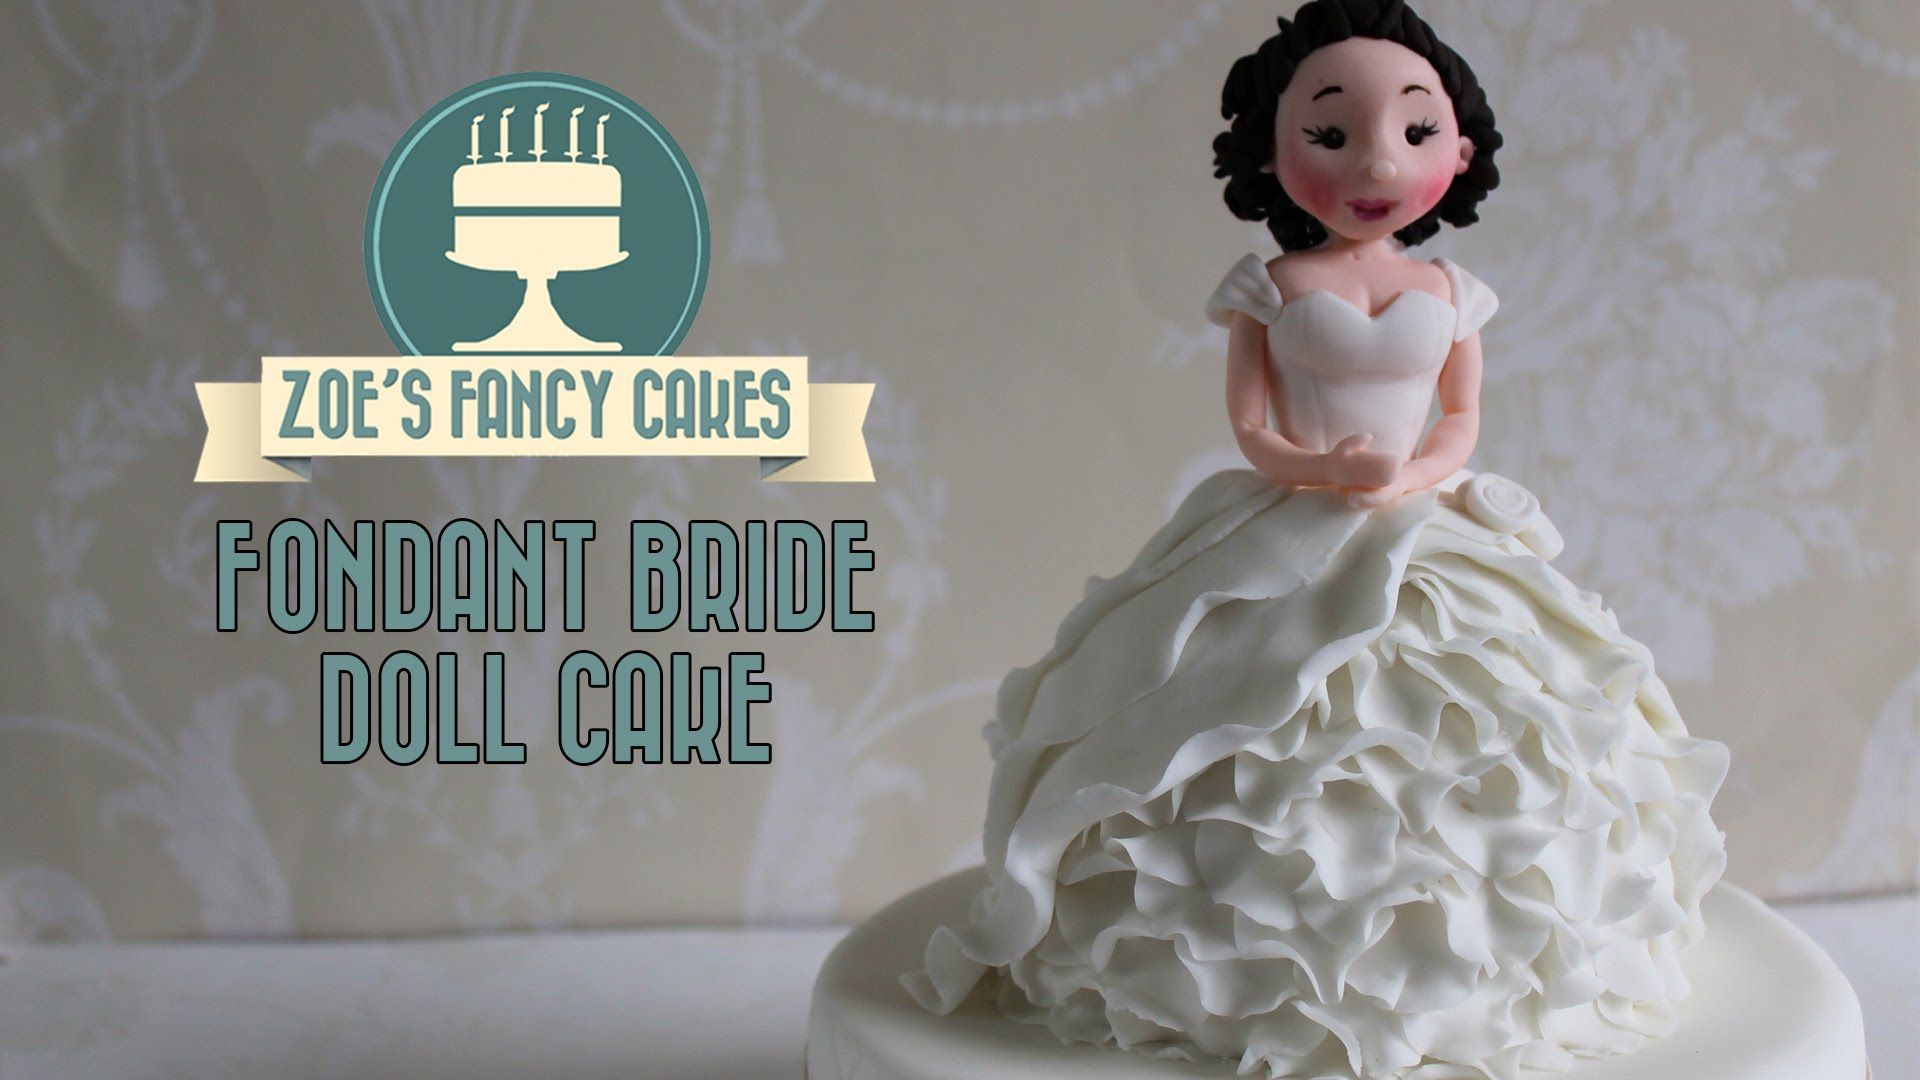 How to make a fondant bride doll cake or cupcake How To Cake Tutorial